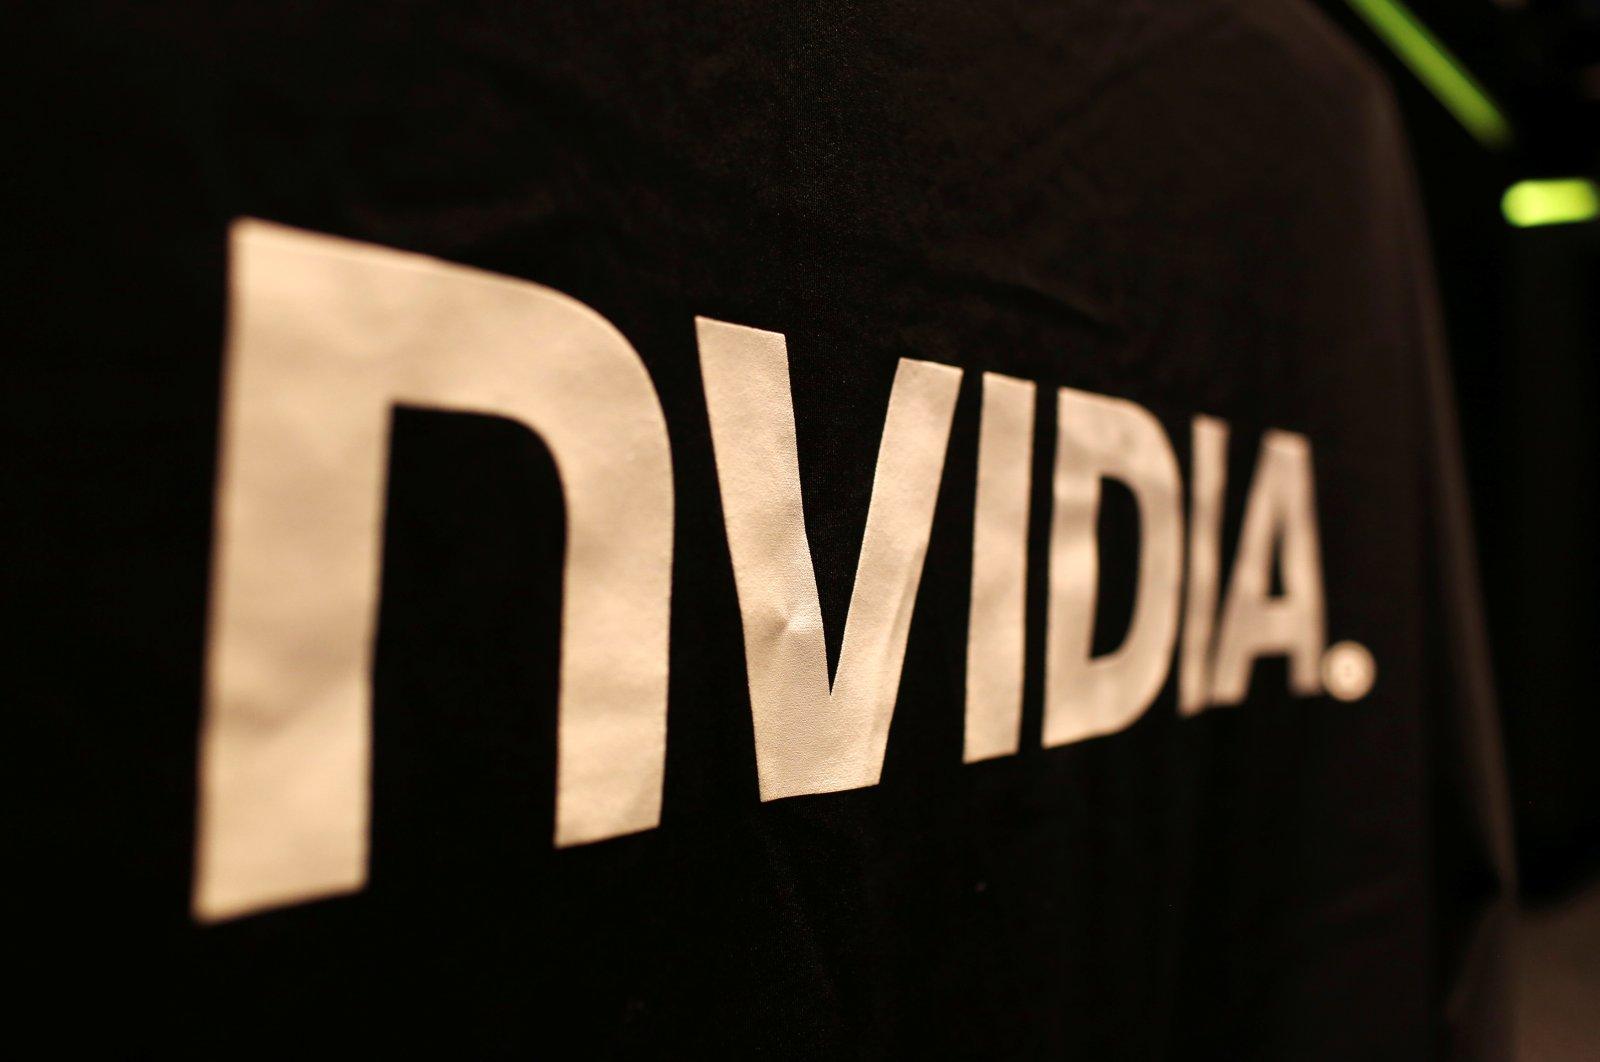 The logo of technology company Nvidia is seen at its headquarters in Santa Clara, California, U.S., Feb. 11, 2015. (REUTERS Photo)